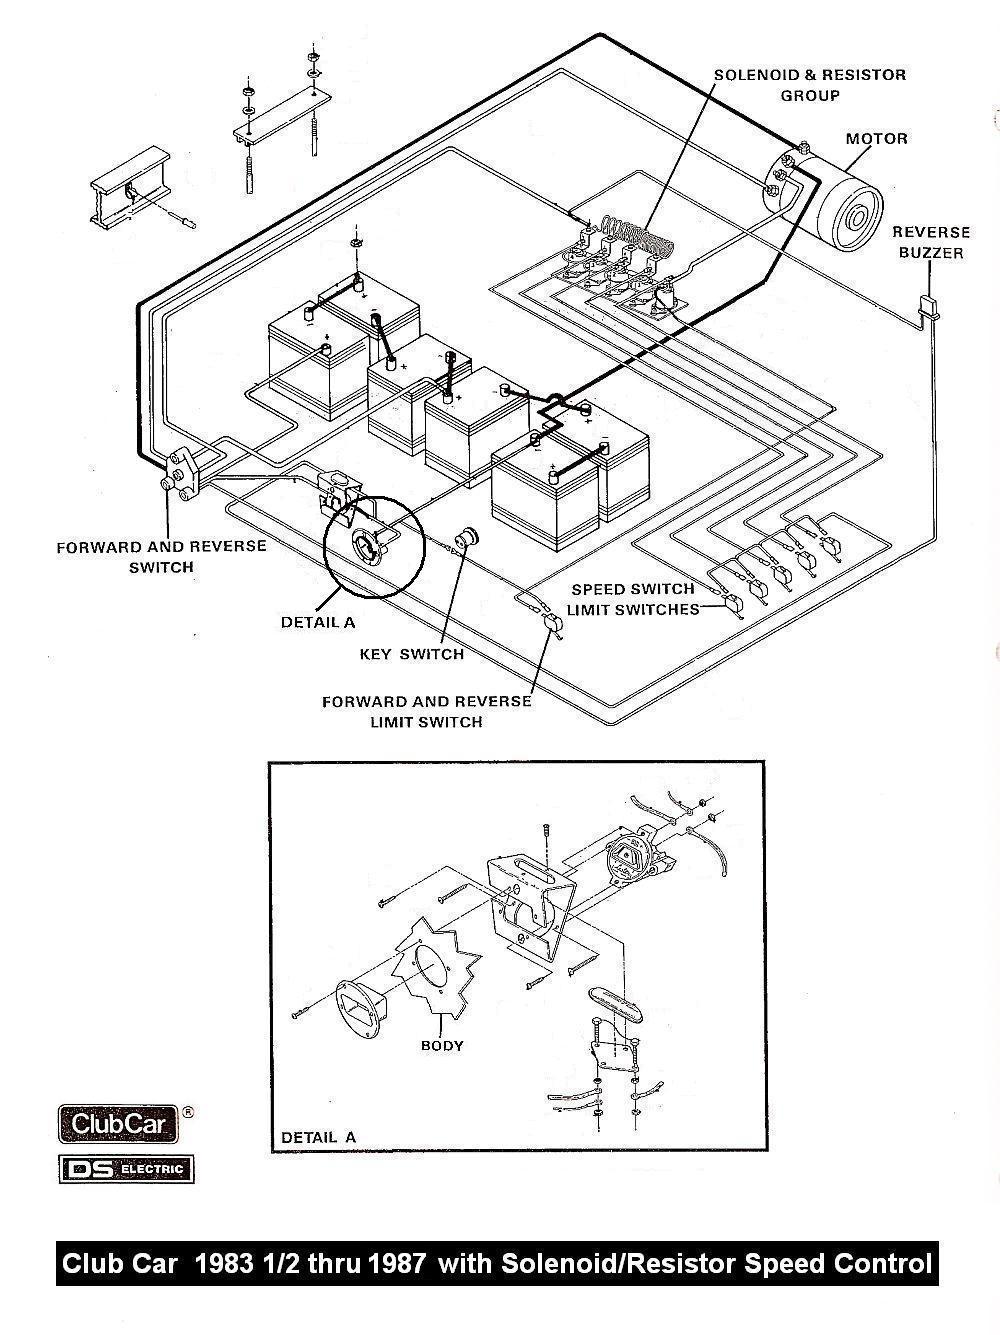 wiring diagram for club car ds